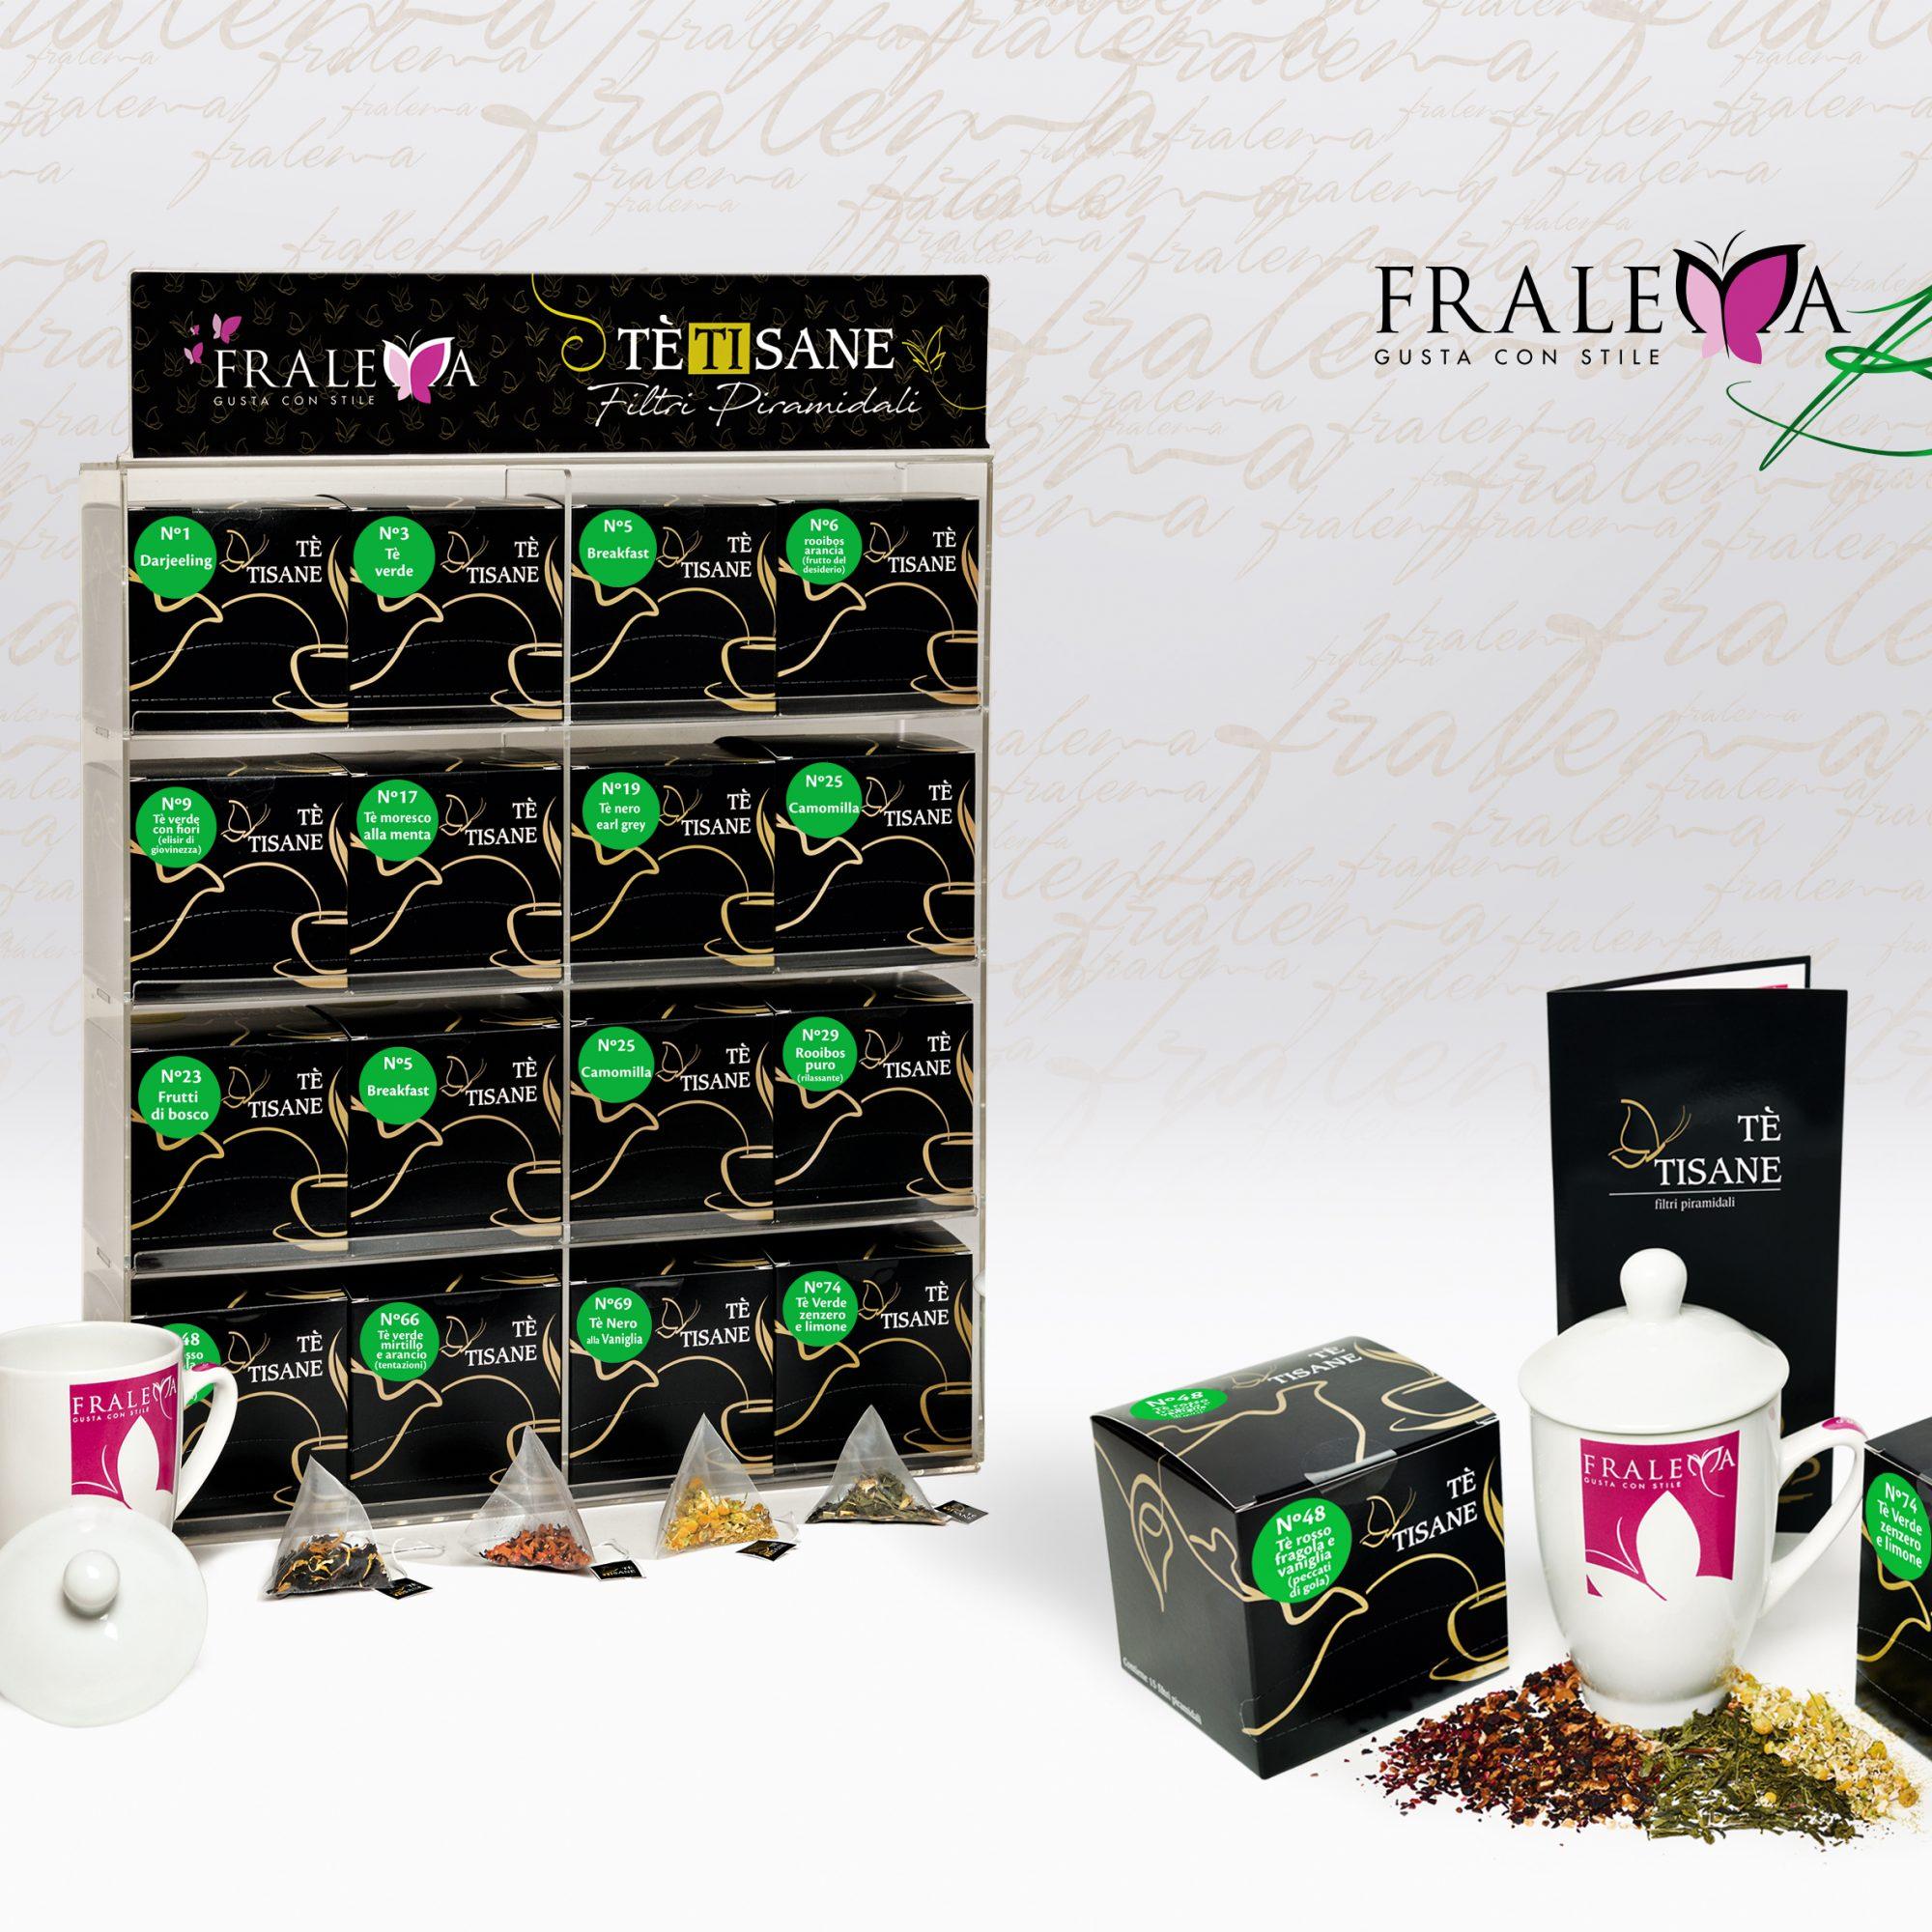 fralema_prodotti per la caffetteria_i caldi_tè_tisane bio_filtri piramidali